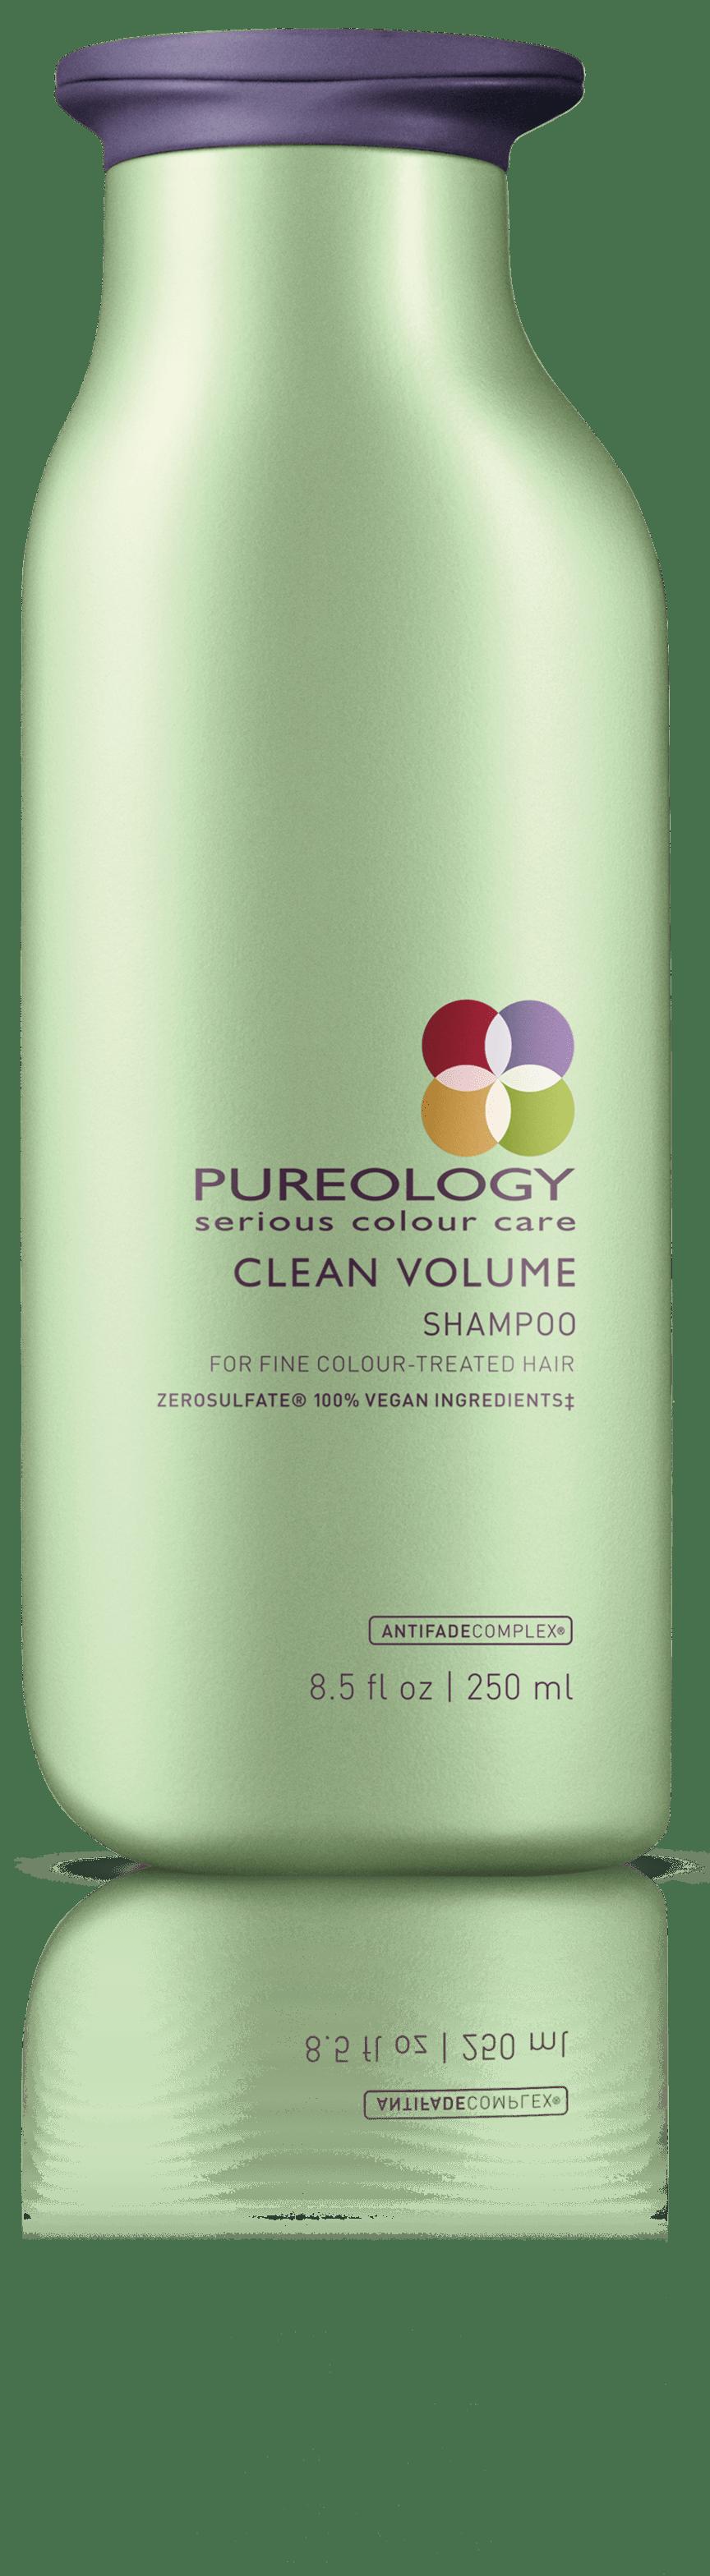 CleanVolume_Shampoo_RBG_Large_150DPI_Reflection